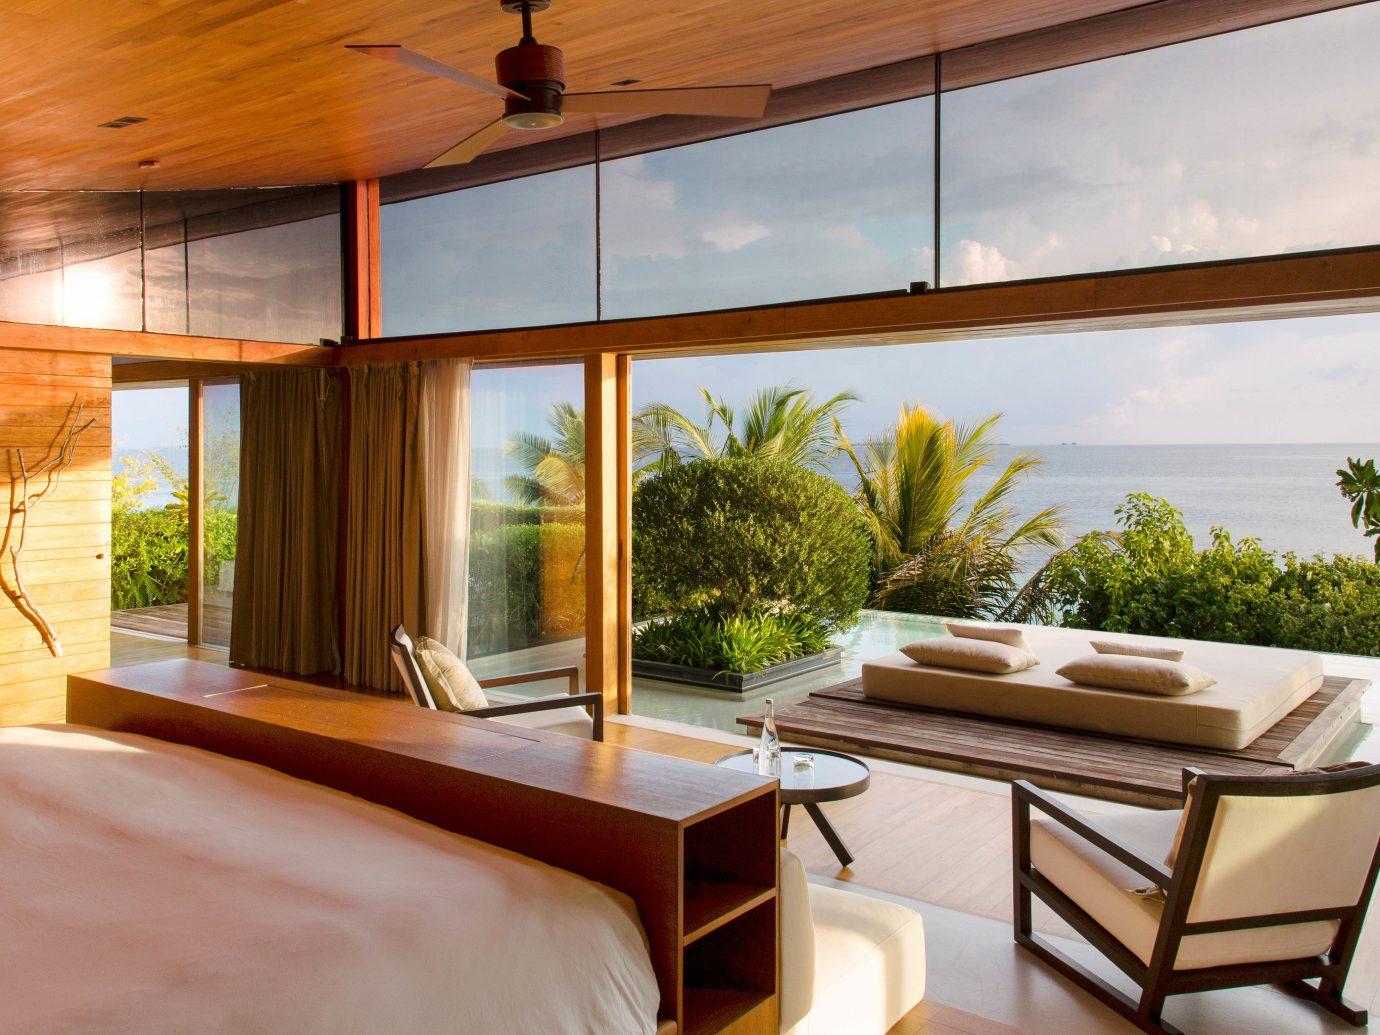 bedroom at Coco Prive in the Maldives